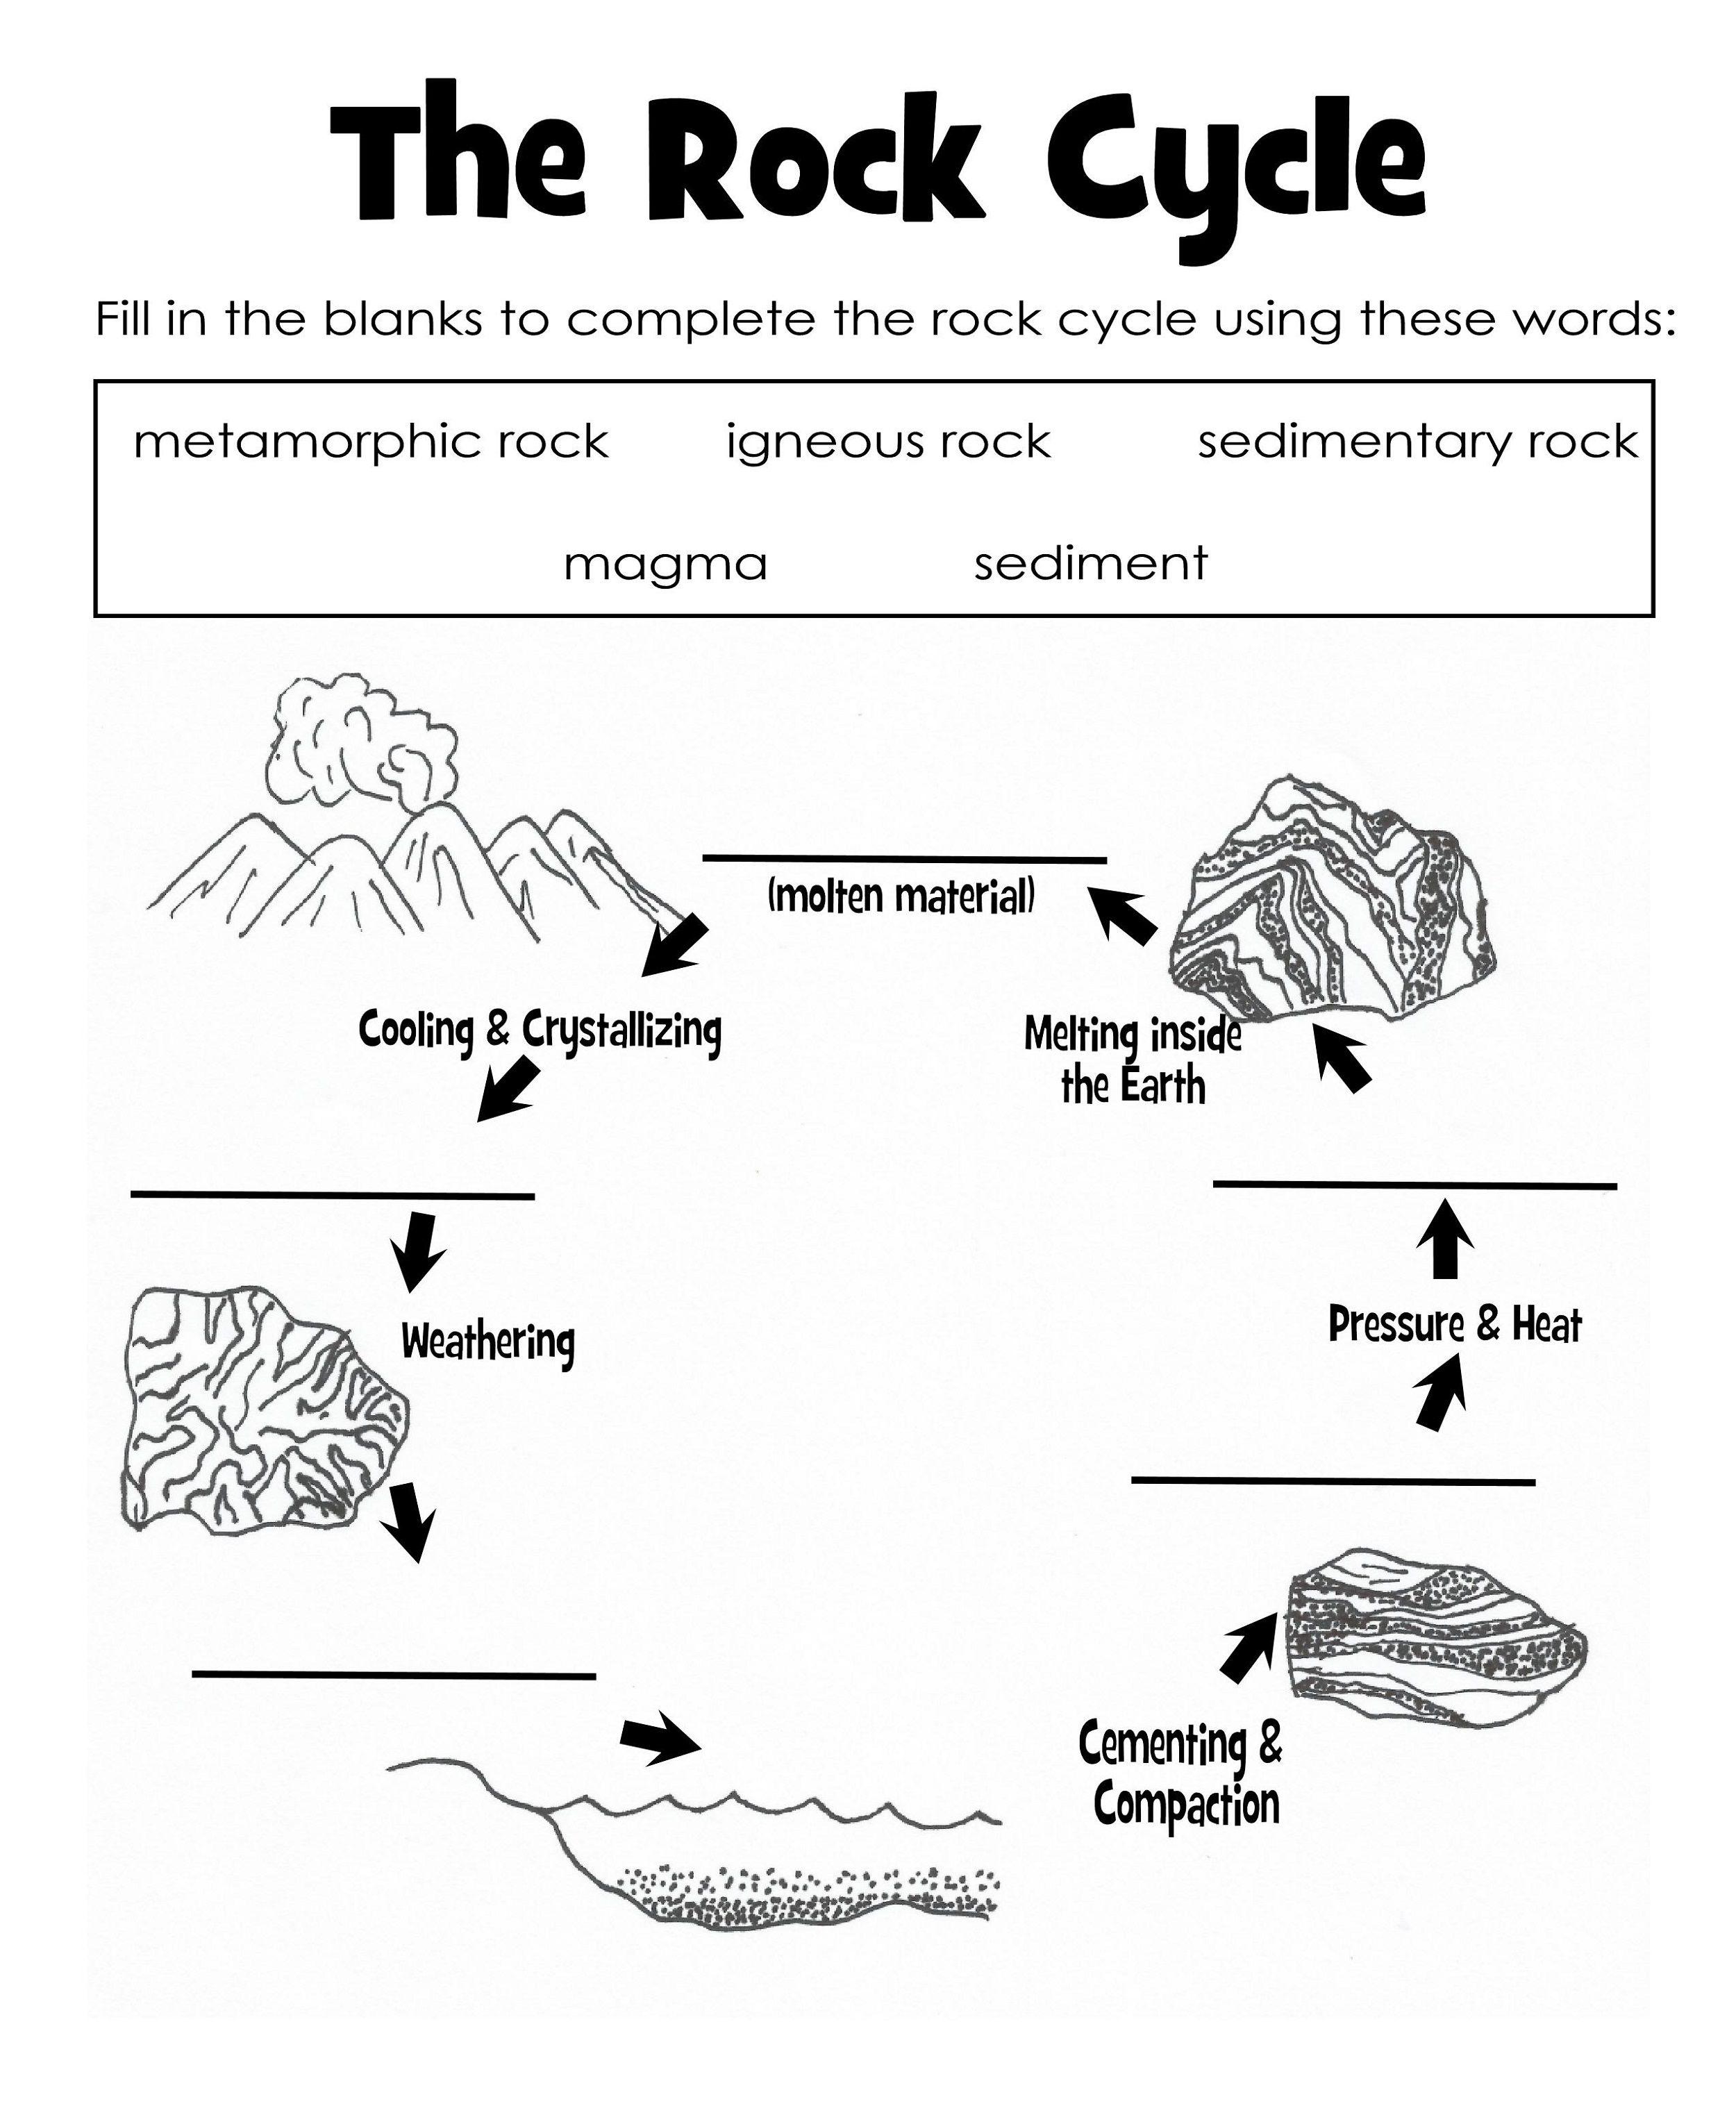 The Rock Cycle Diagram Worksheet Label | Science Printable For Kids - Rock Cycle Worksheets Free Printable